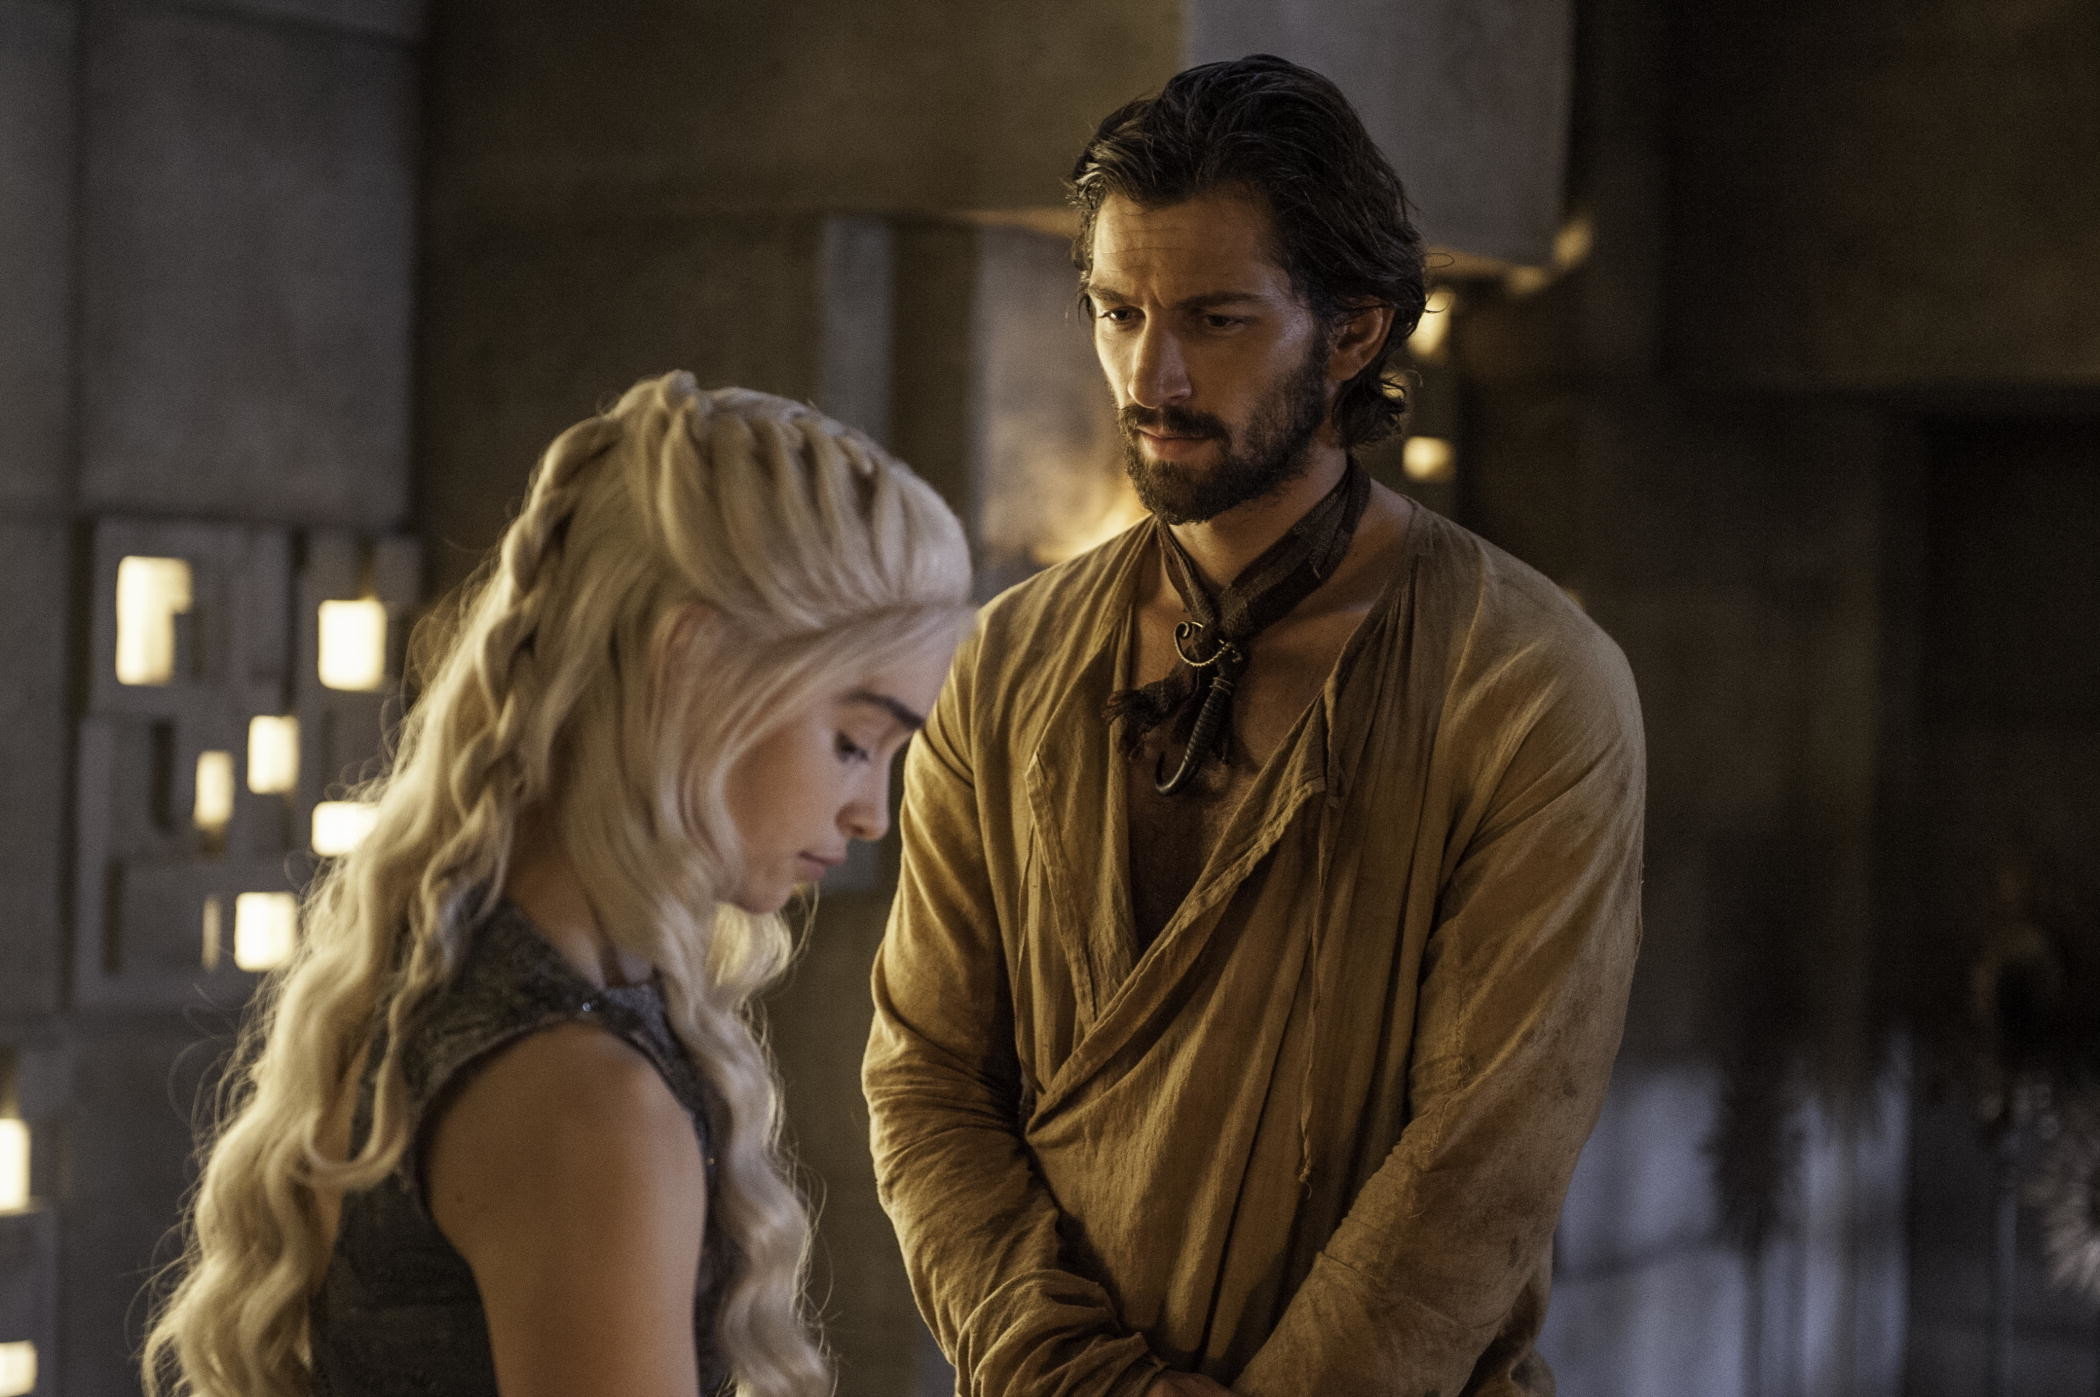 Daario Naharis images Daario Naharis and Daenerys Targaryen HD wallpaper  and background photos